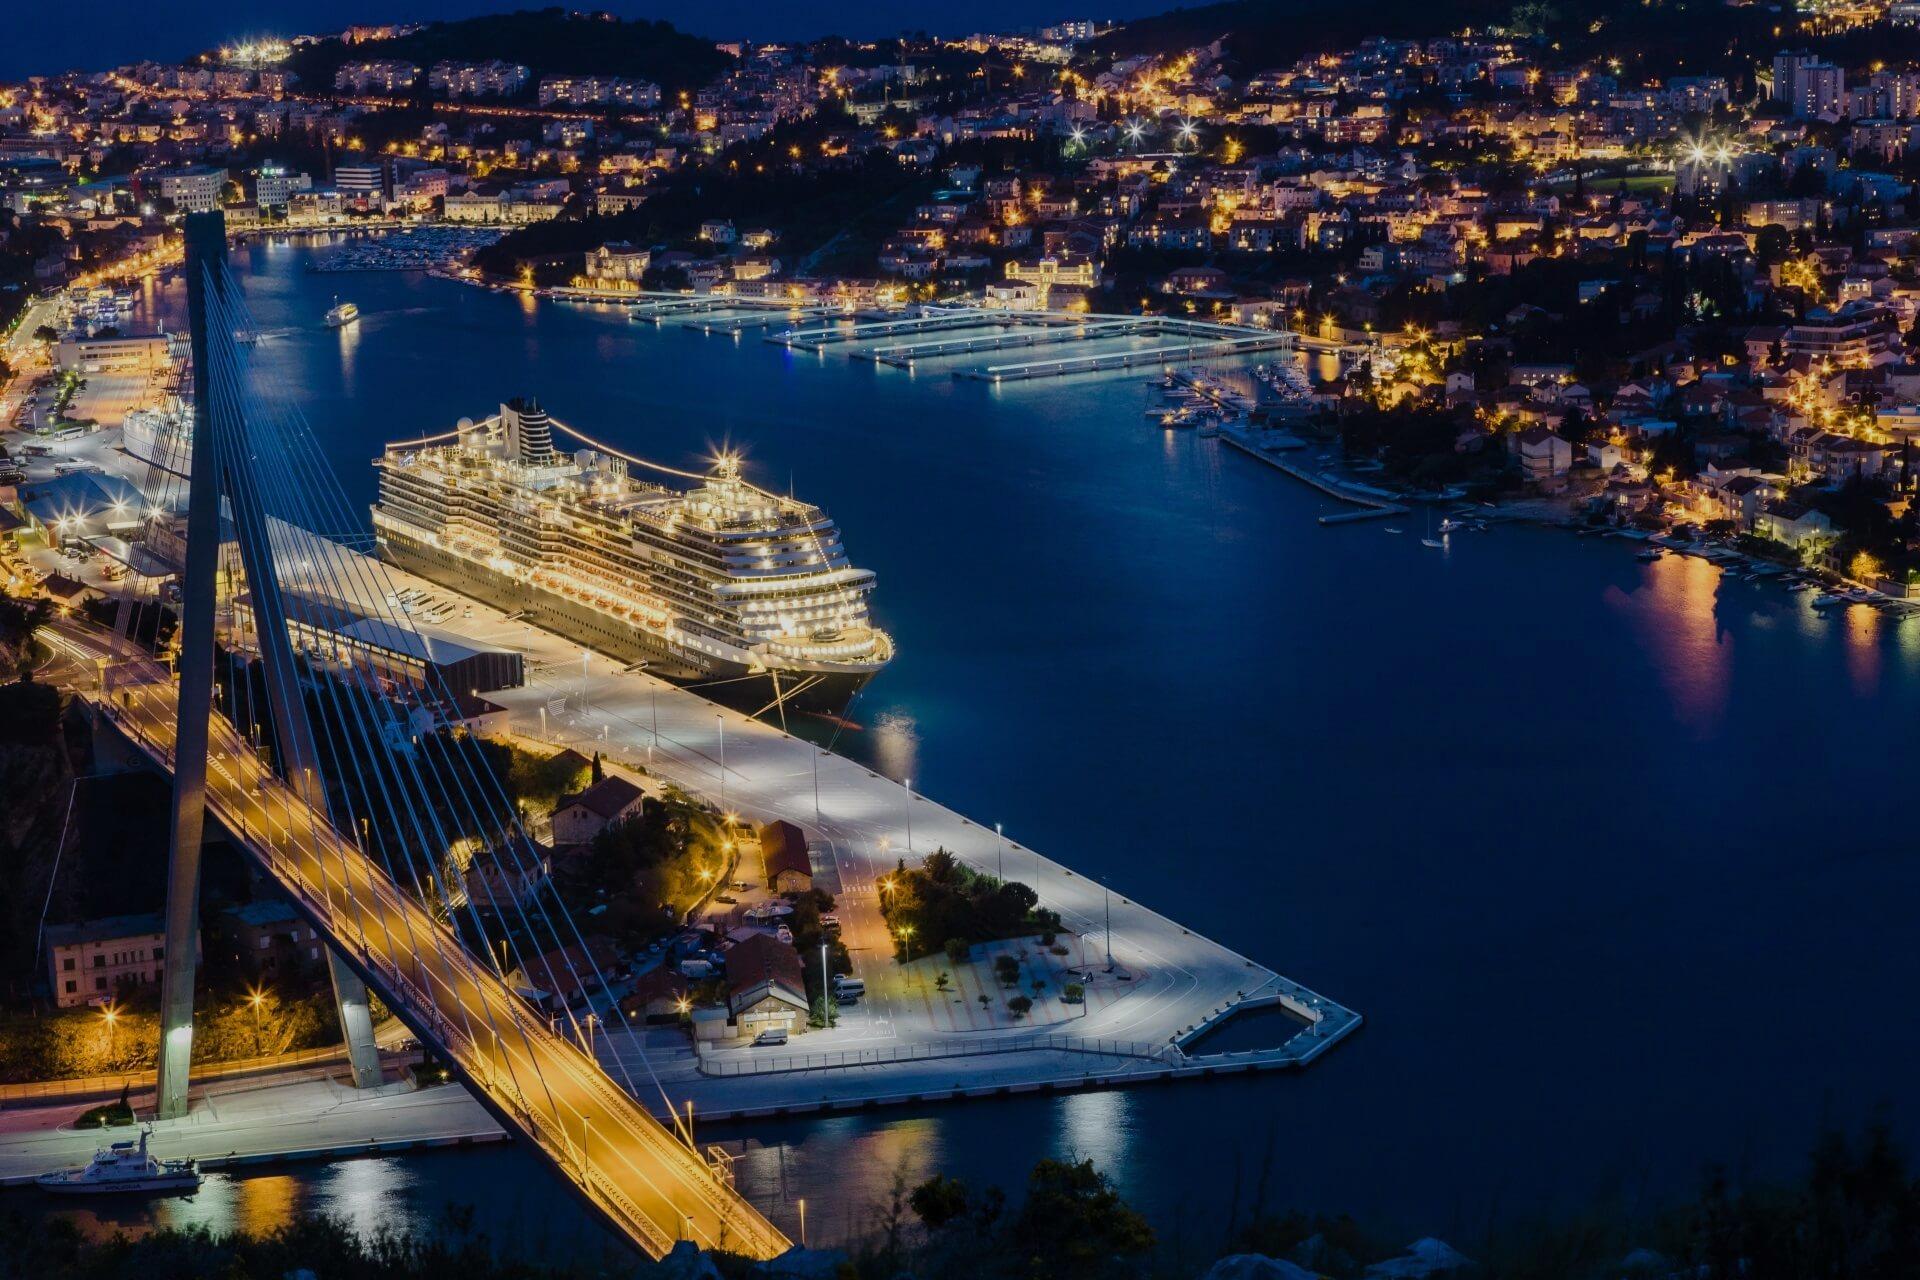 port dubrovnik at night